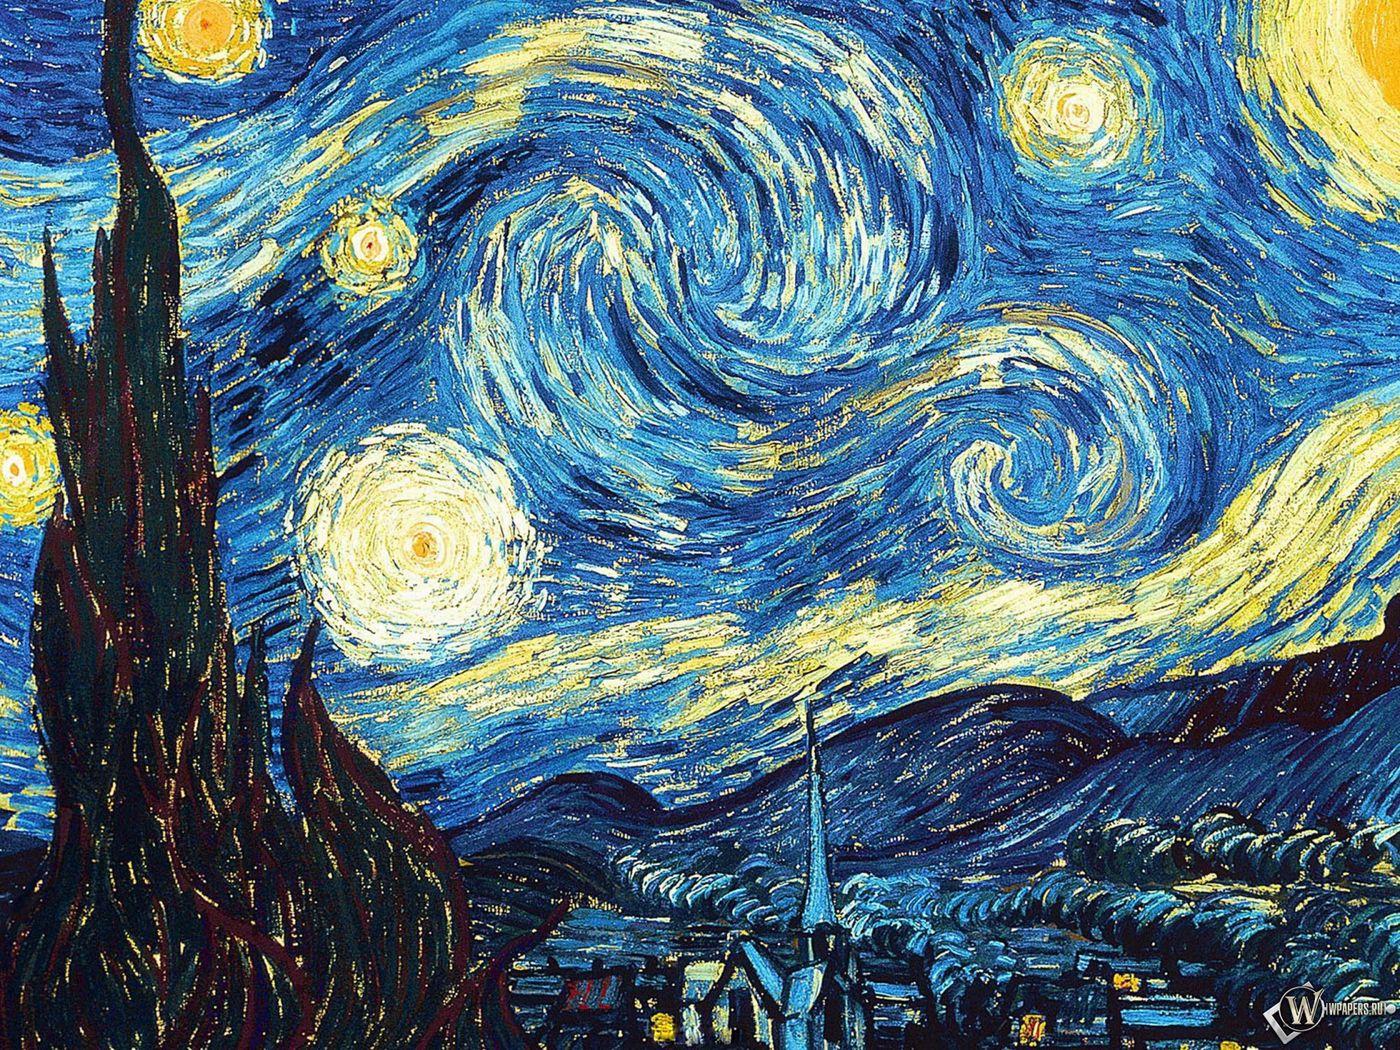 1400x1050 Wallpaper vincent van gogh, the starry night, oil, canvas